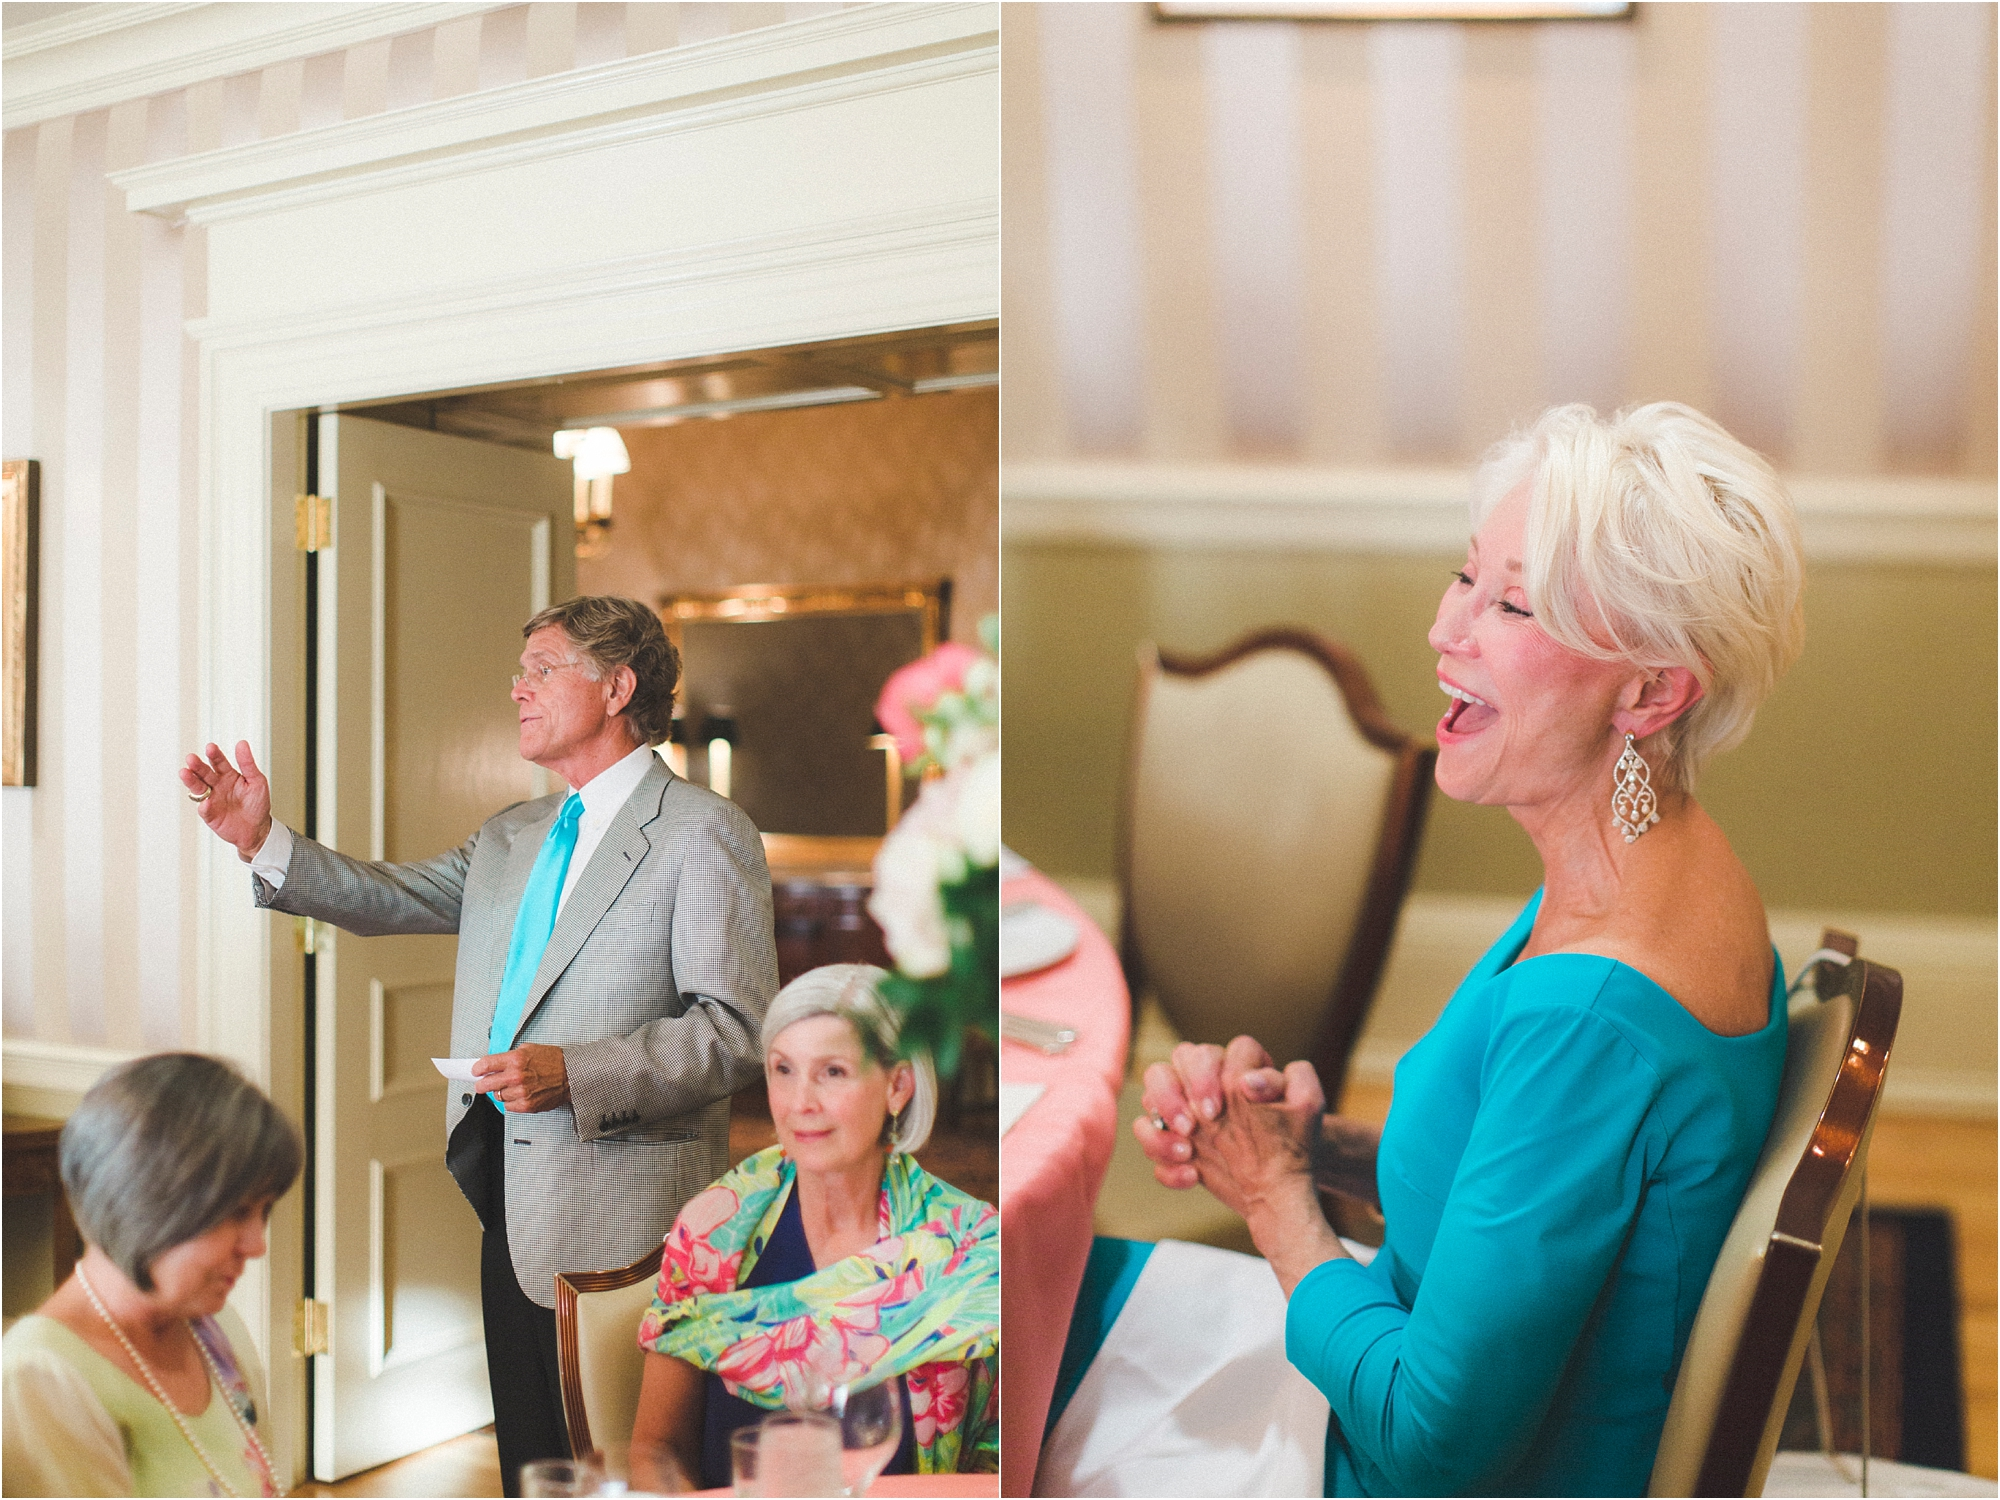 stephanie-yonce-photography-chic-historic-home-wedding-richmond-virginia-photos_0029.jpg